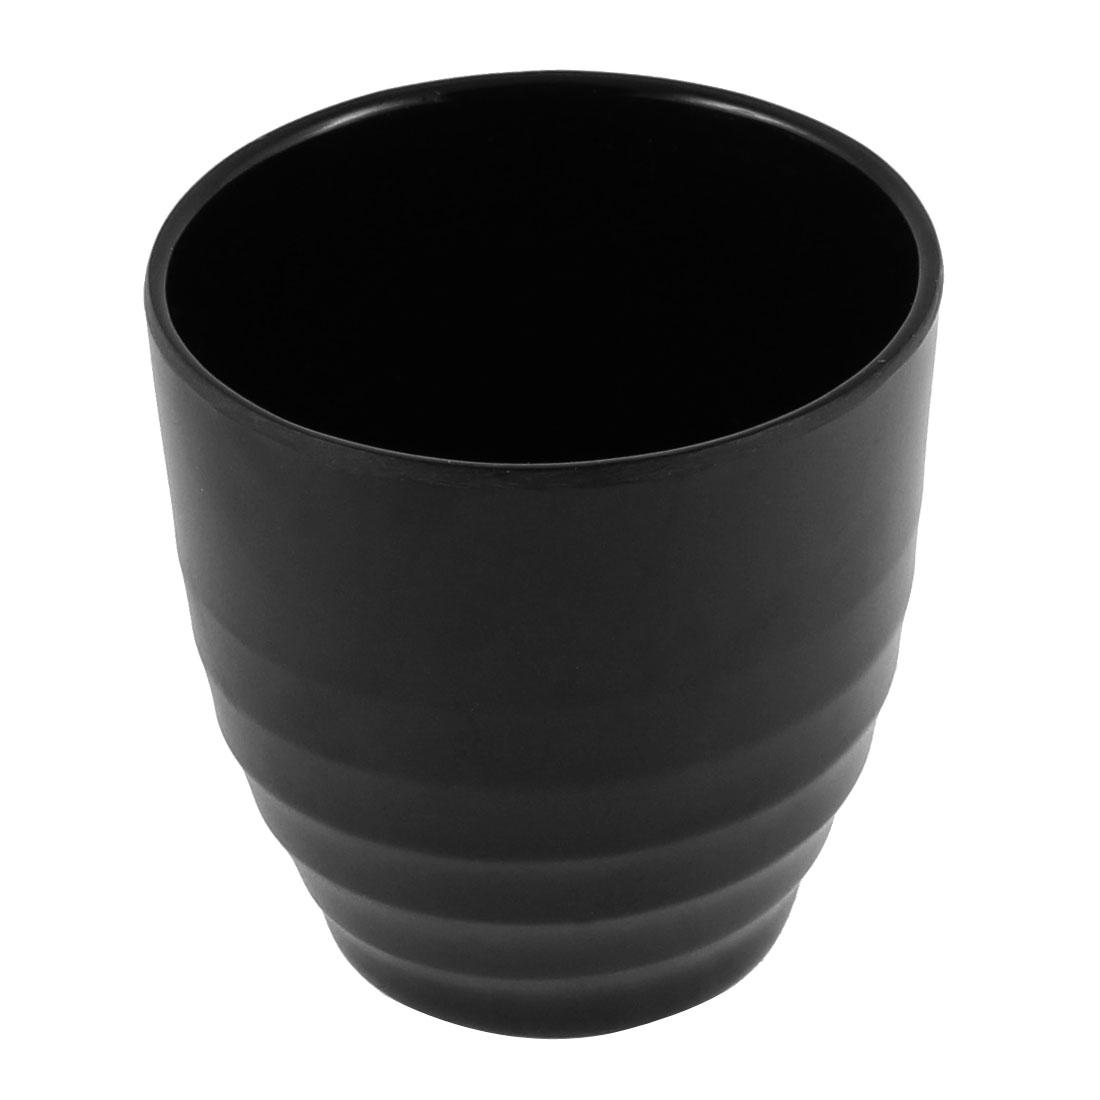 Home Table Desk Water Drink Beverage Coffee Cup Holder Black